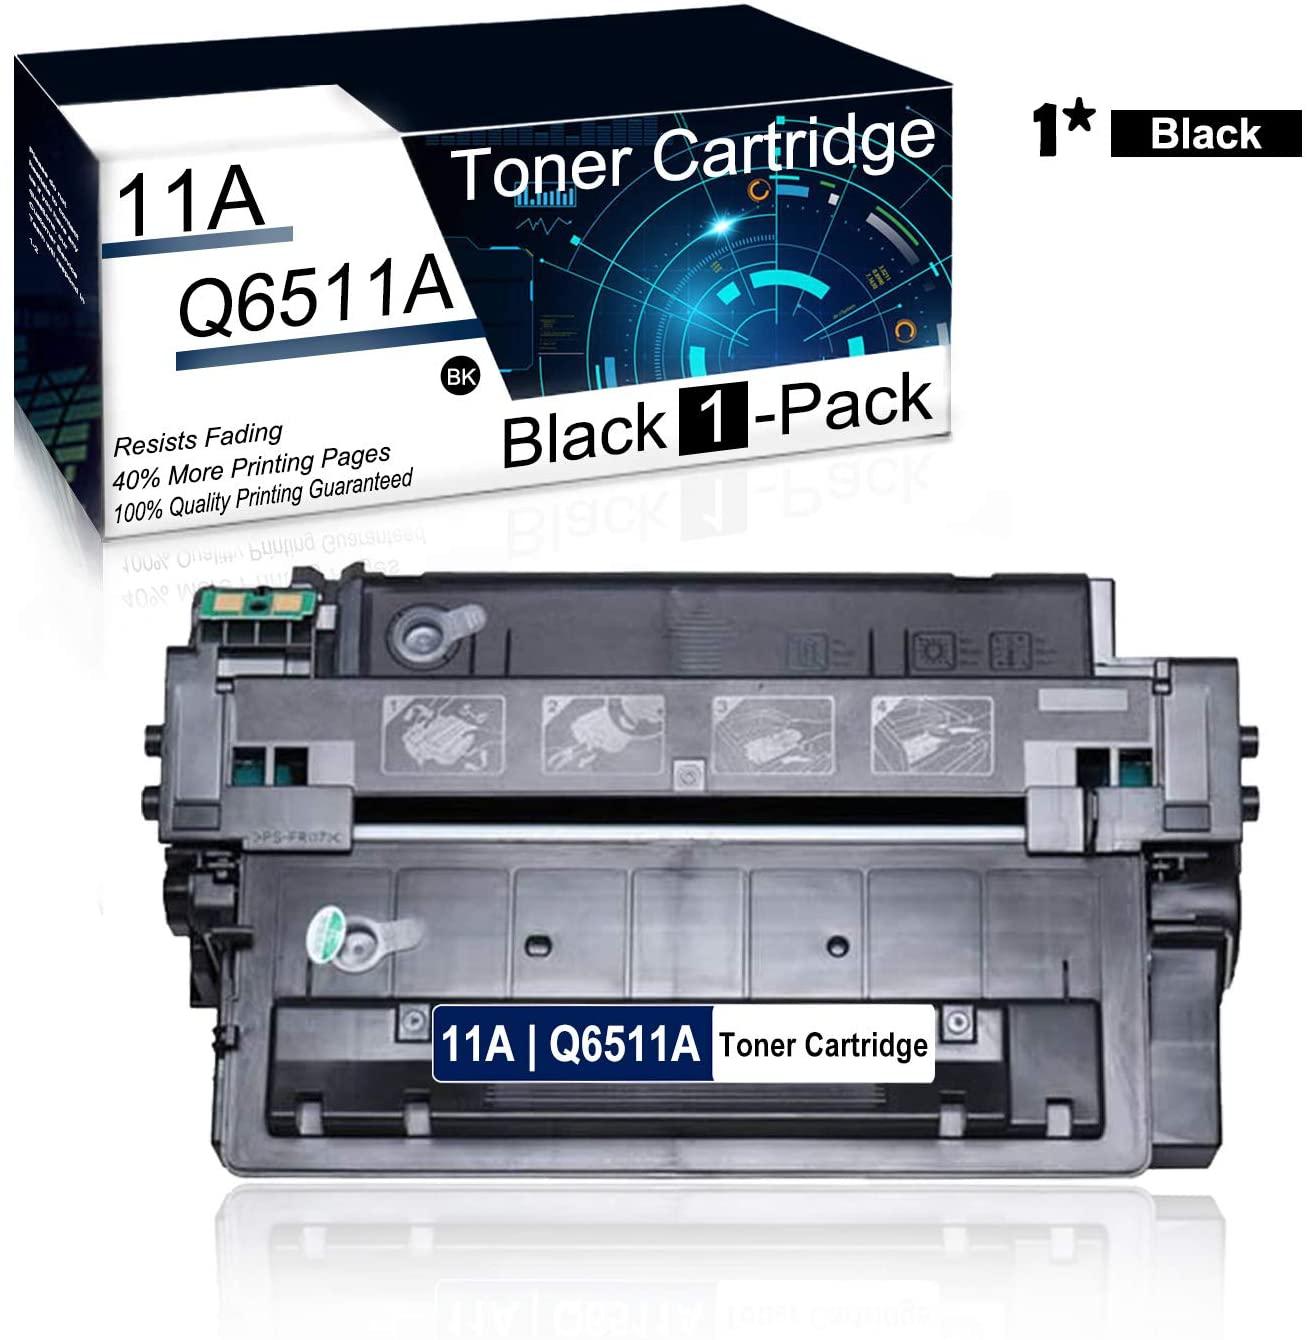 (1Pk,Black) Compatible 11A   Q6511A Toner Cartridge Used for HP Laserjet 2430 2410 2420 2420d 2420n 2420dn 2430tn 2430dtn 2430n Printer Toner Cartridge.